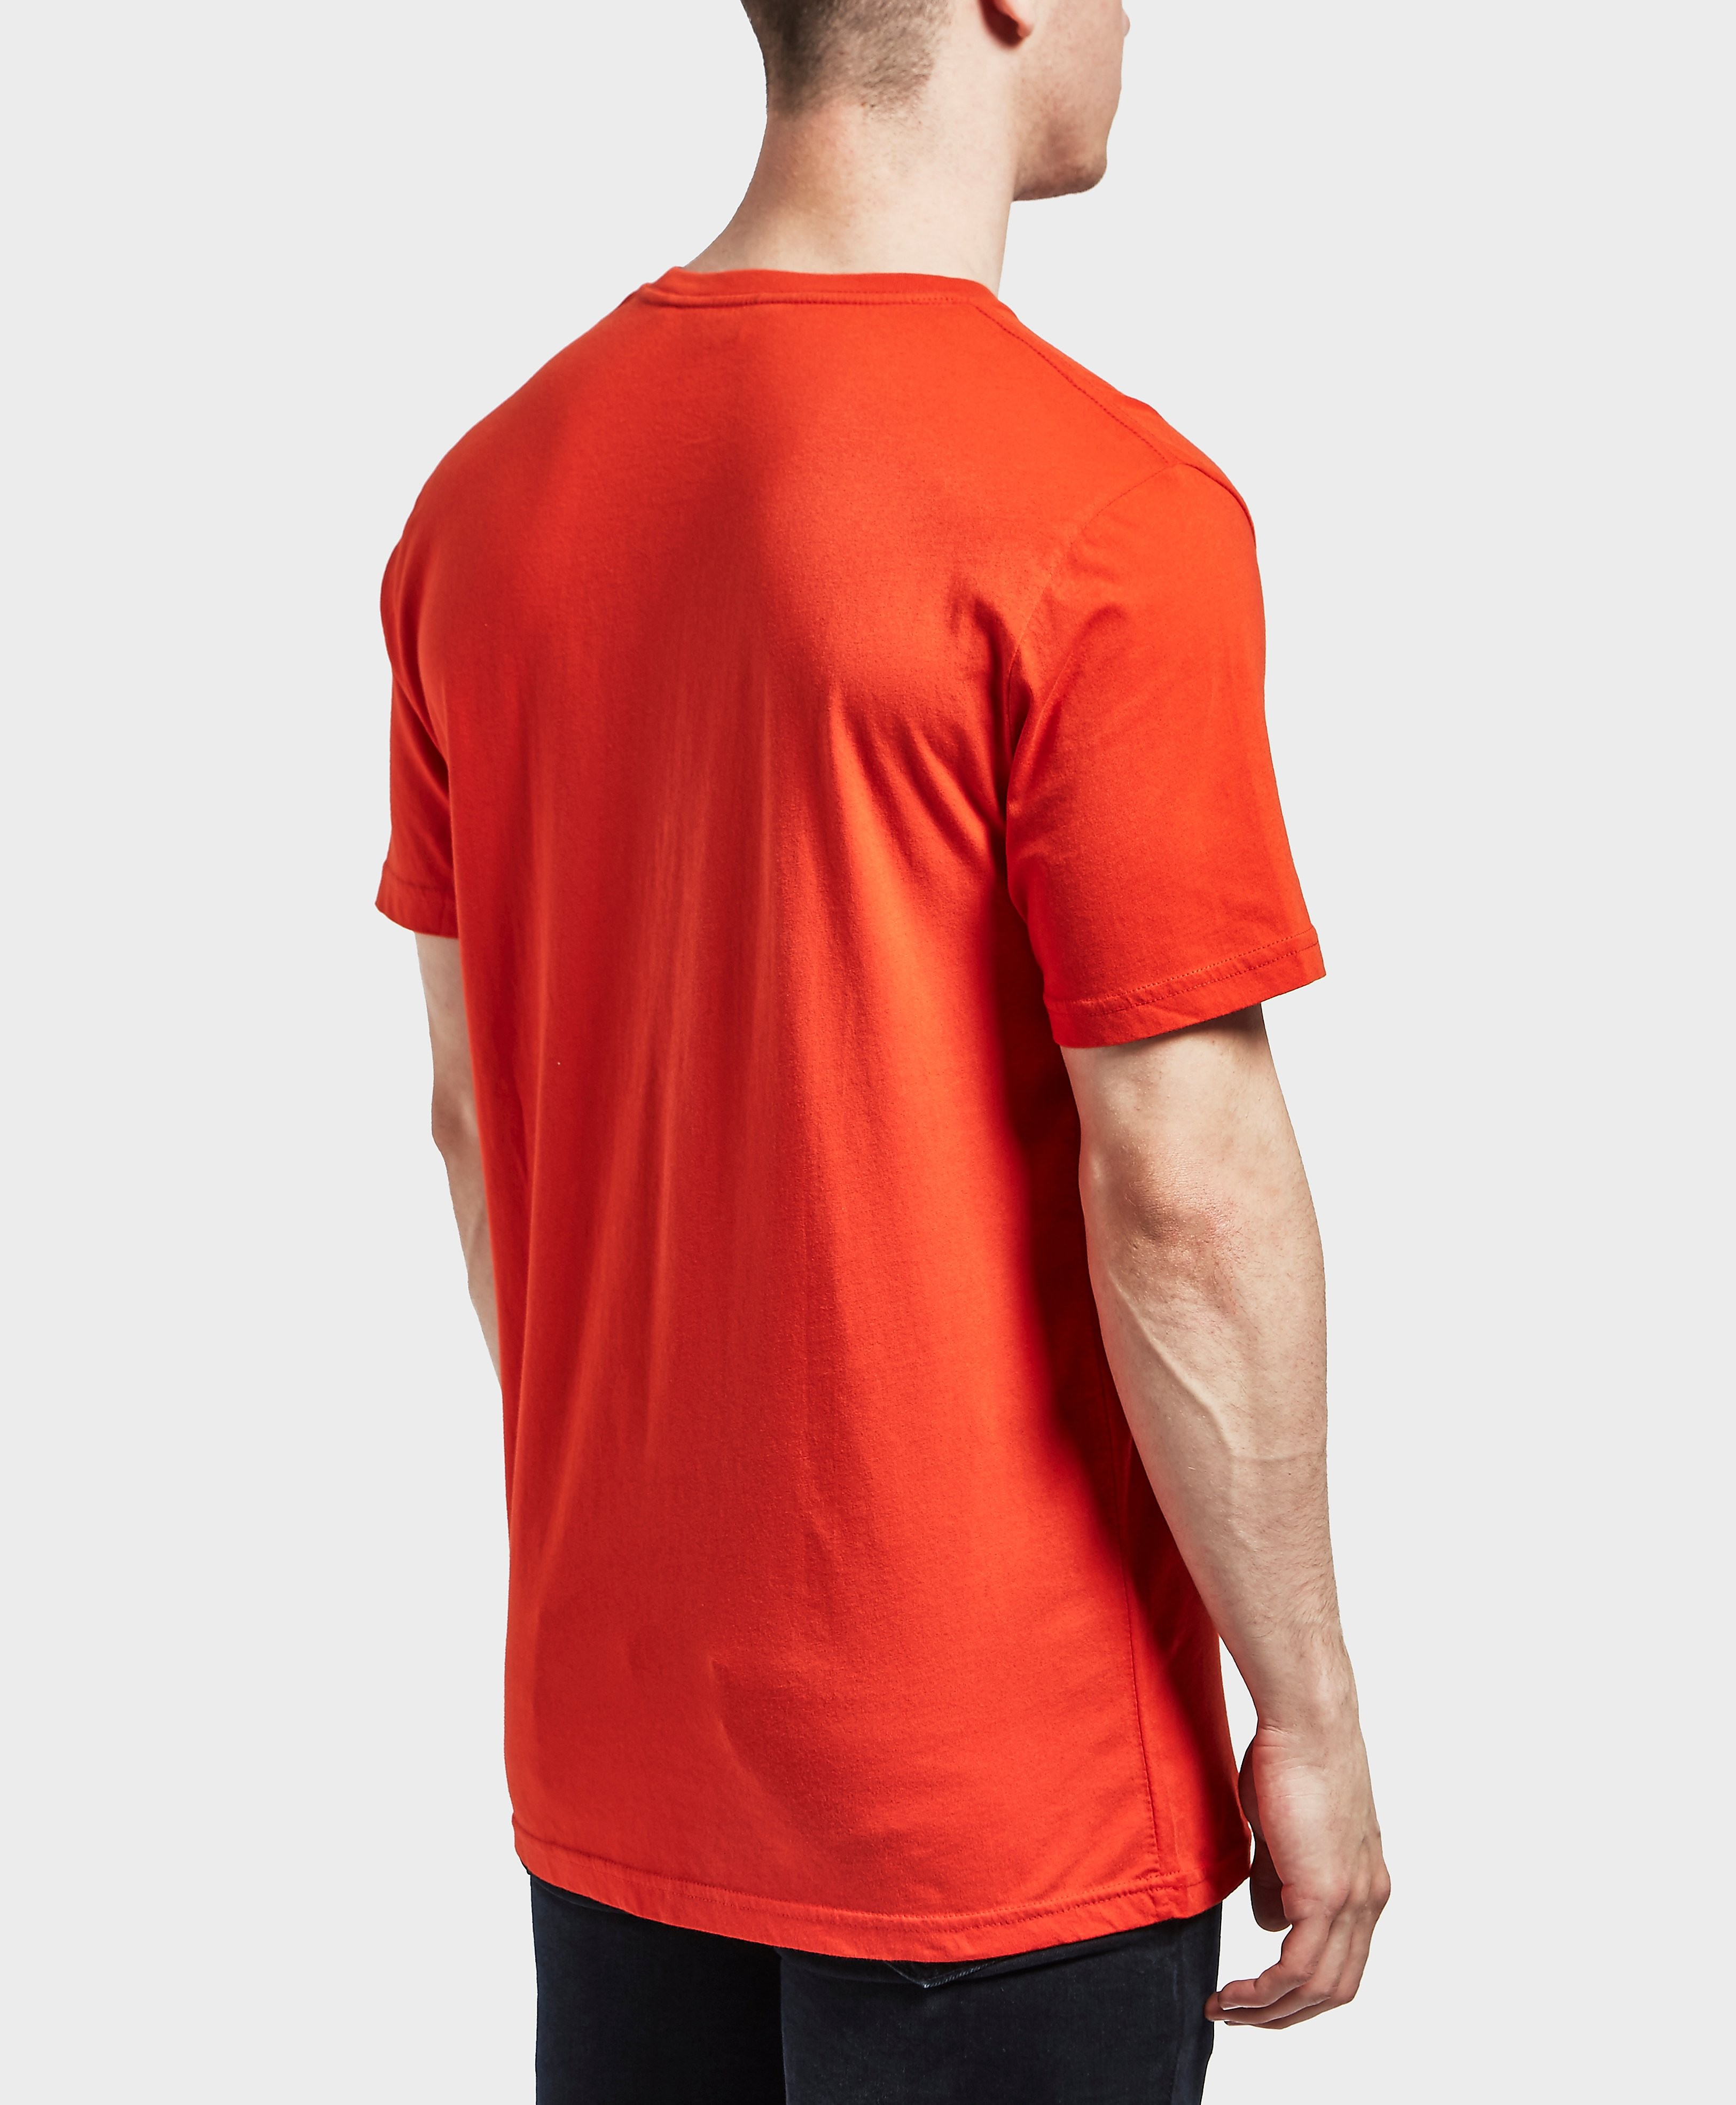 Penfield Brockton Short Sleeve T-Shirt